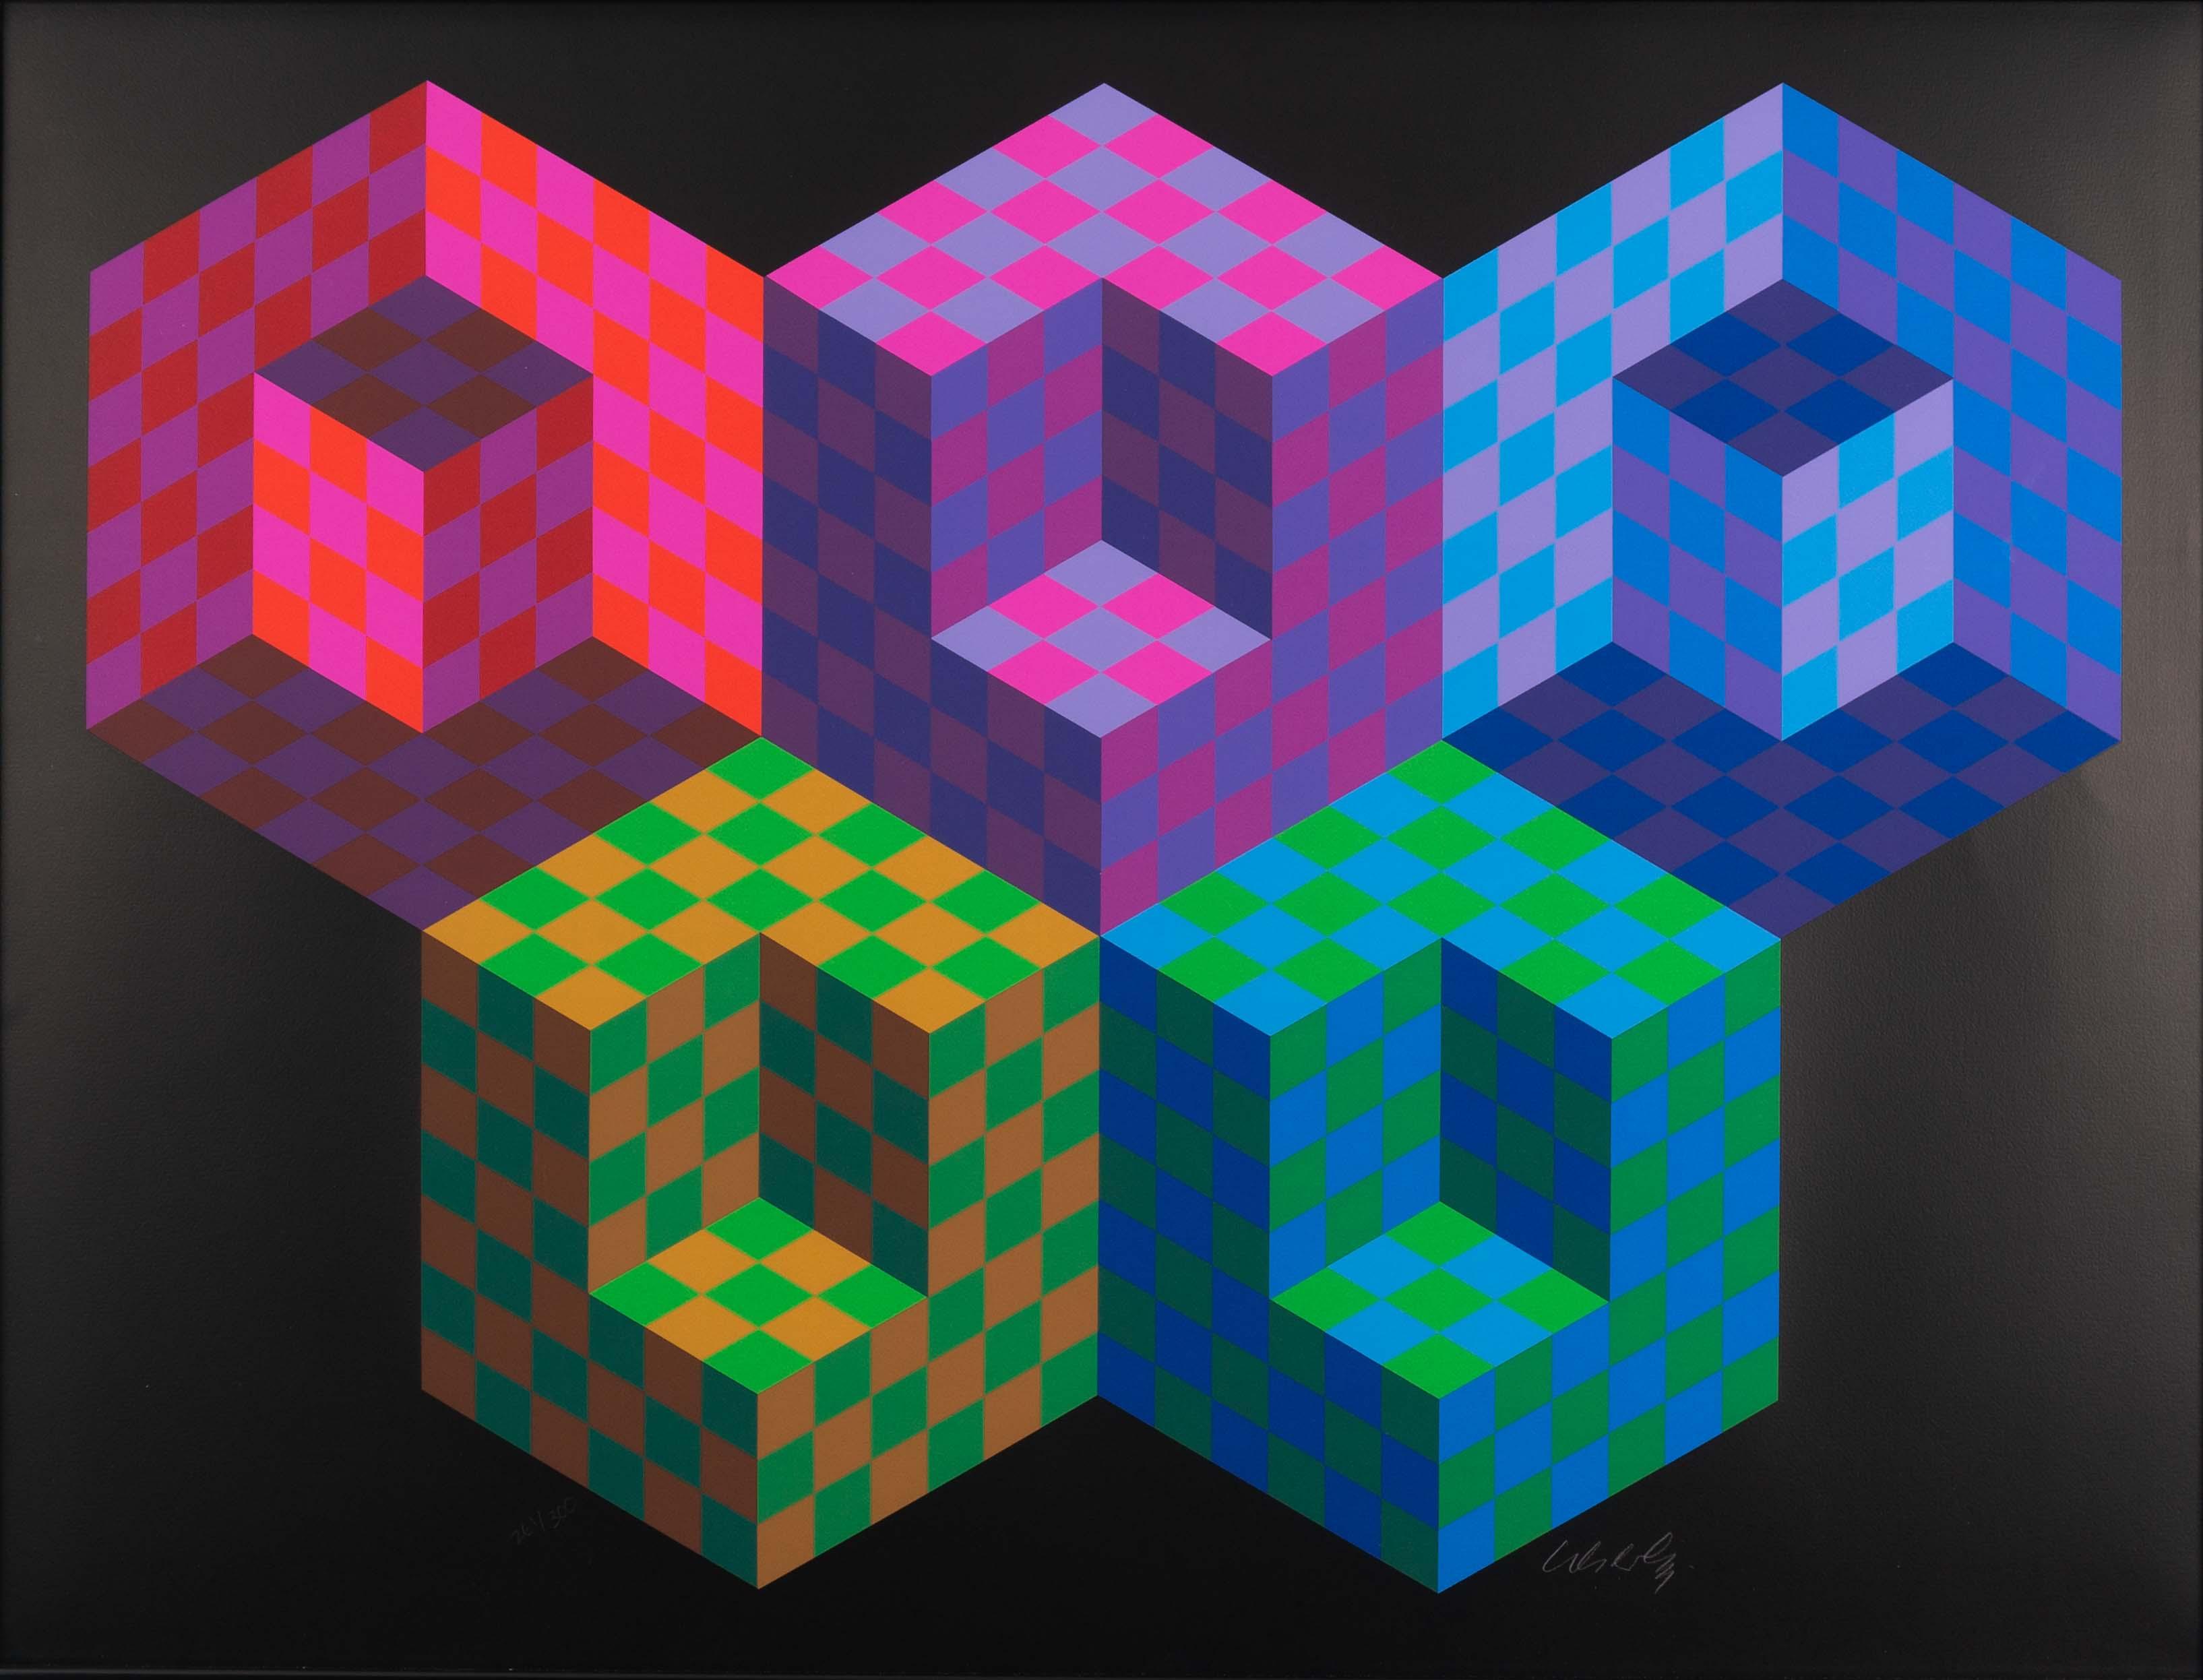 Victor Vaserely - Hexa 5 - unframed 14-09-2019 exp (1 van 2)